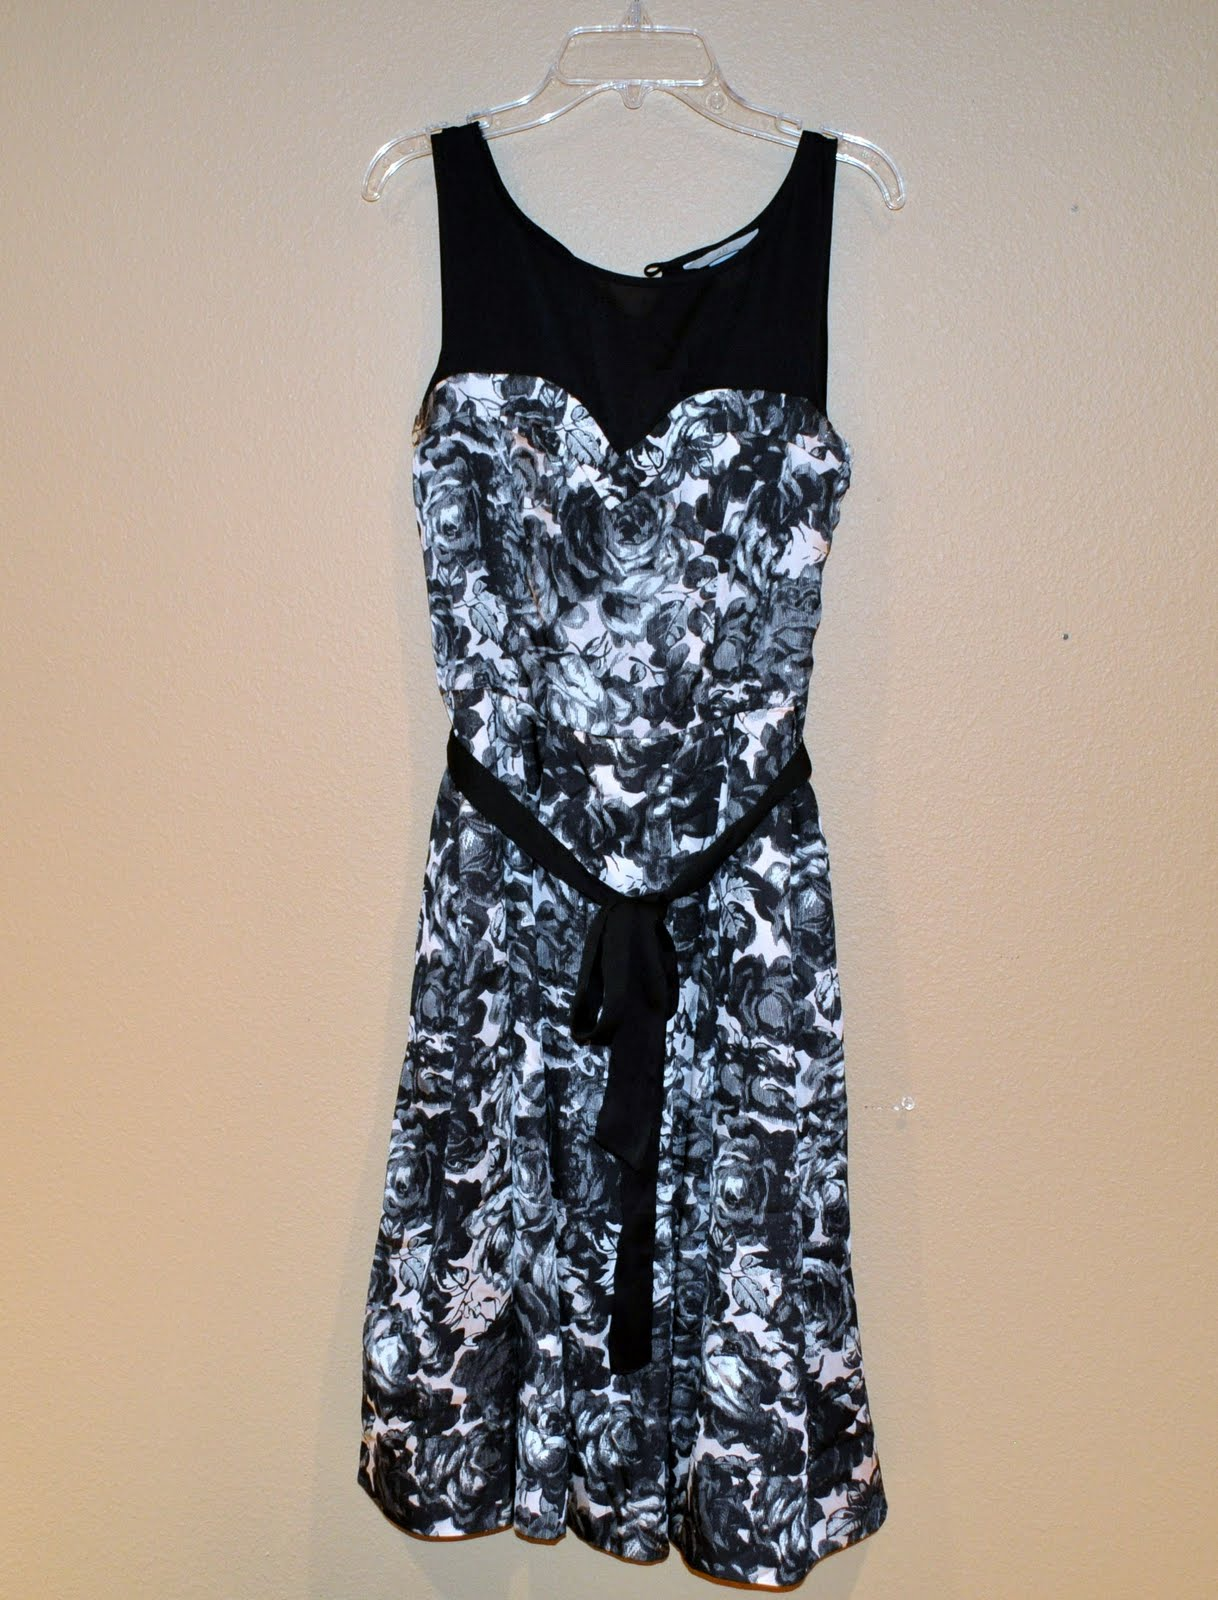 c9a9afeeb7988 Suburbs Mama  Adding Sleeves to Sleeveless Dress